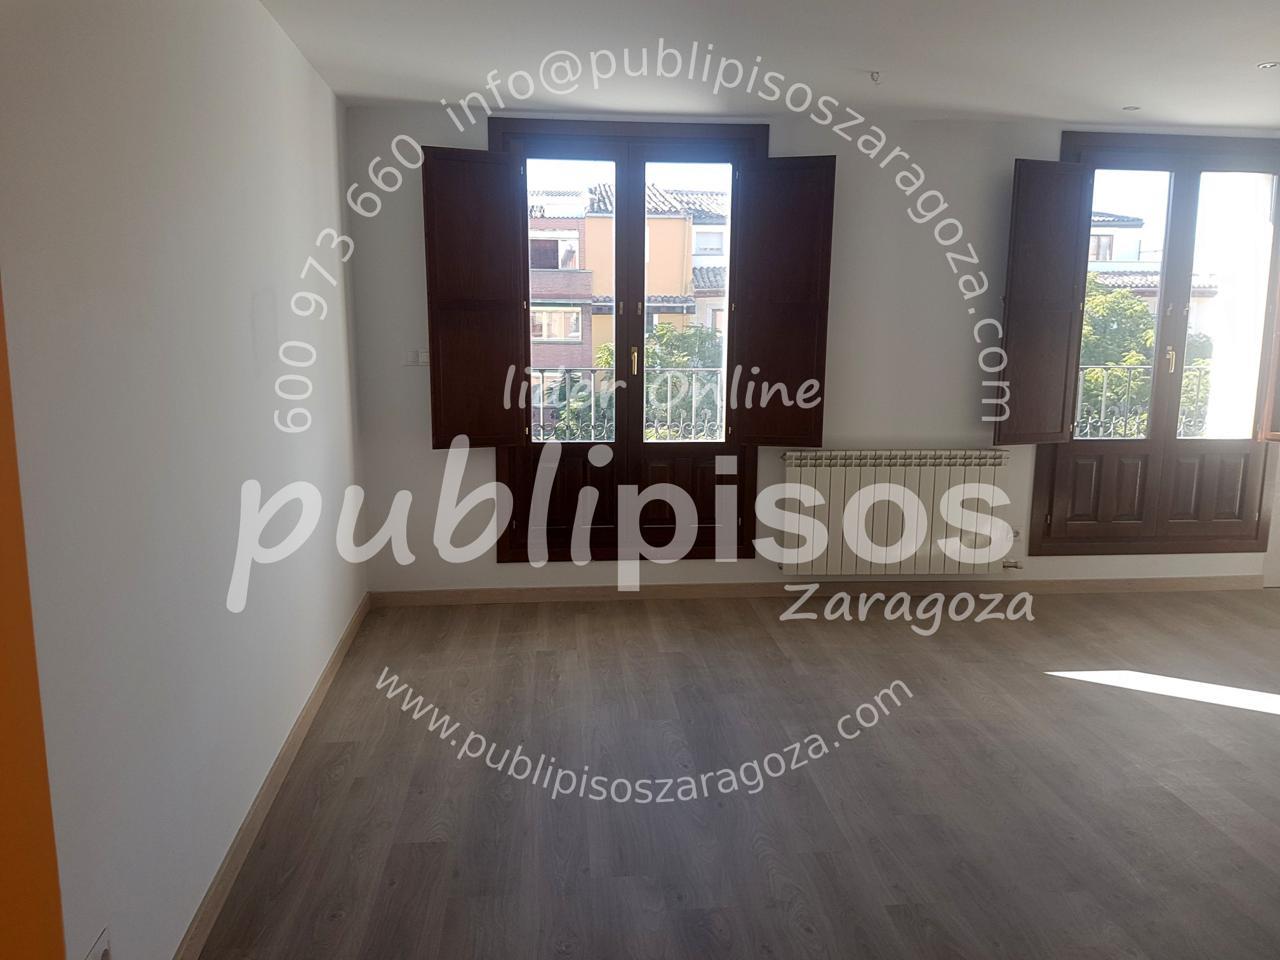 Venta Atico Duplex Obra Nueva Centro Casco Histórico Zaragoza|PUBLIPISOS Inmobiliarias-21